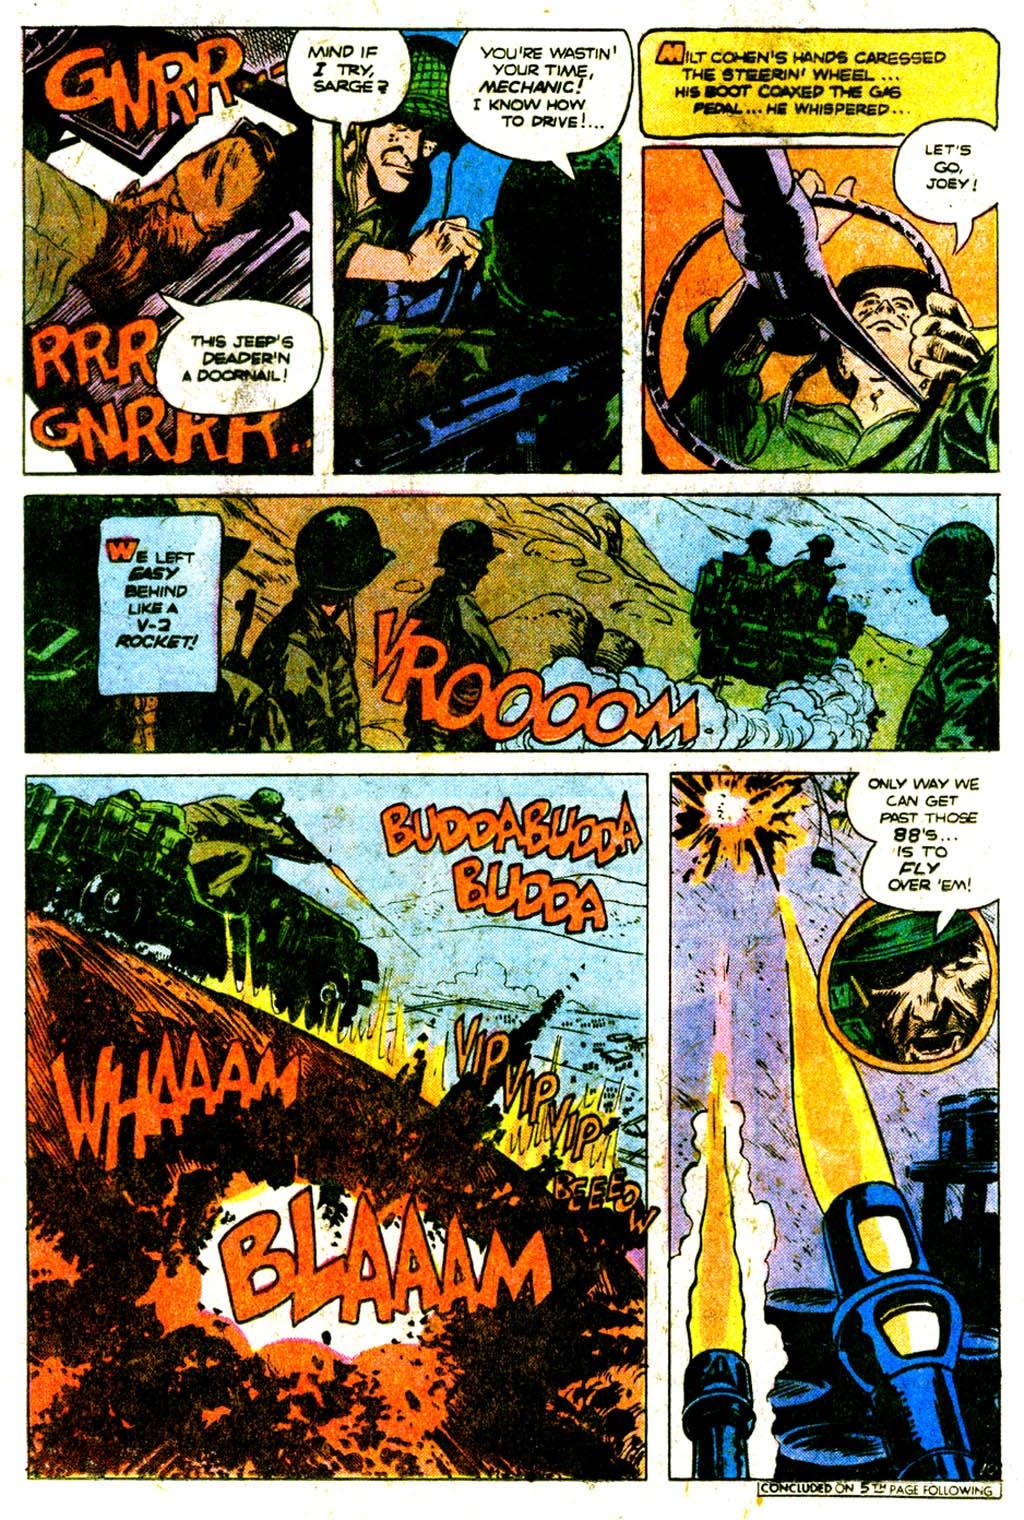 Read online Sgt. Rock comic -  Issue #313 - 15